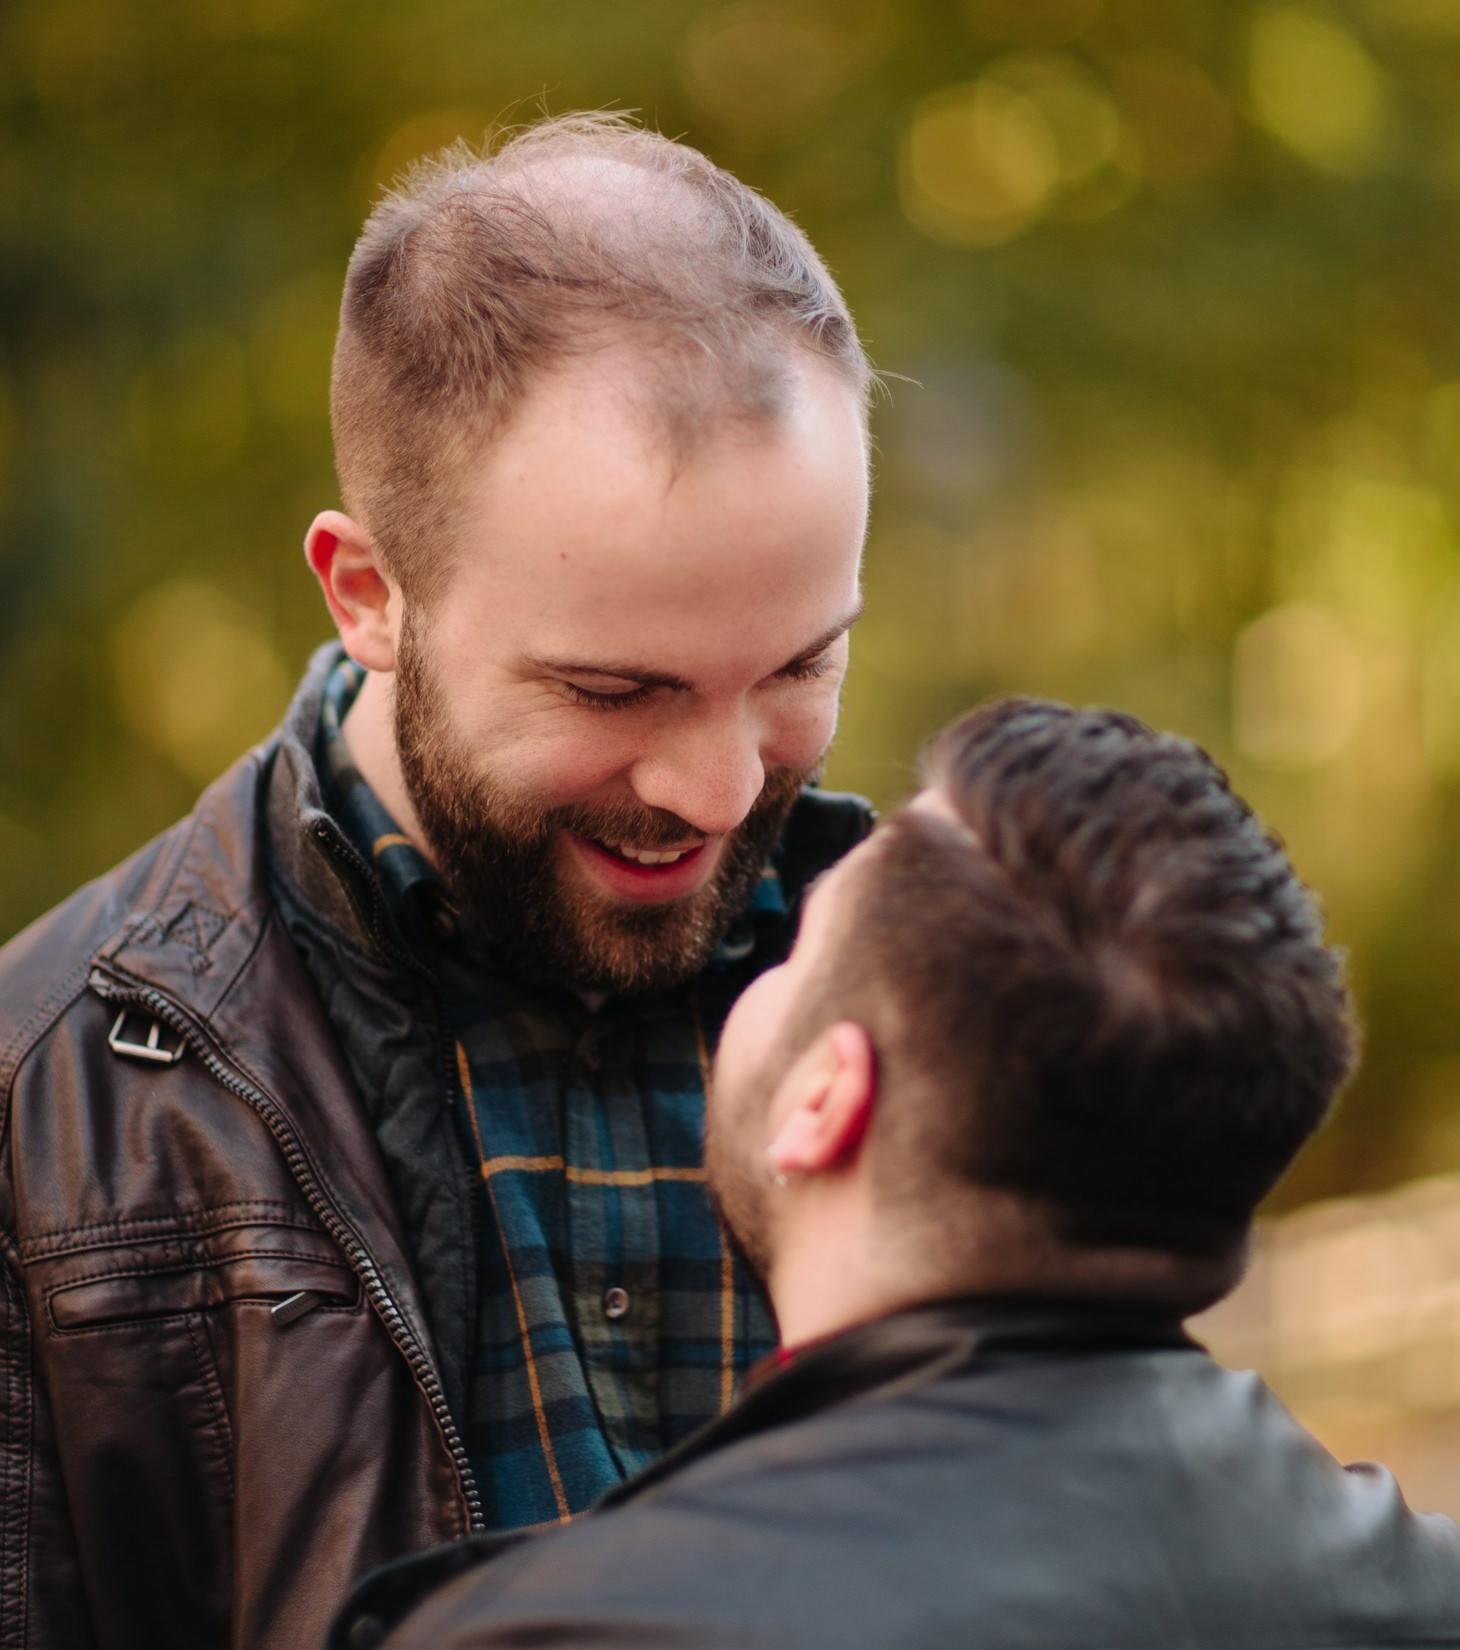 003-nyc-wedding-elopement-lgbt-friendly-photographer-city-hall-kareoke.jpg